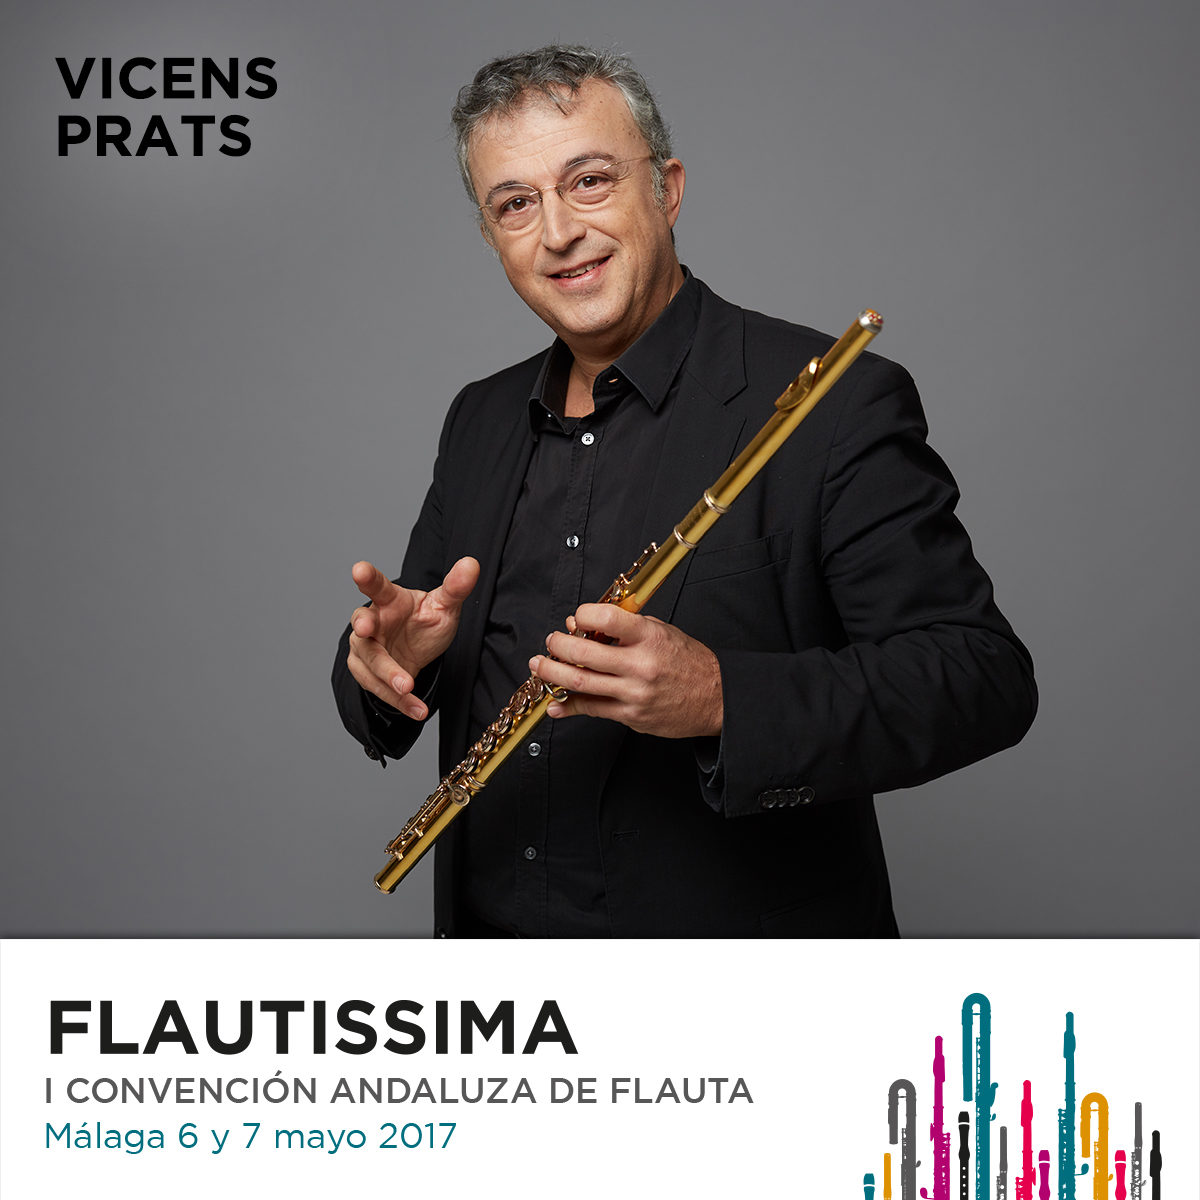 Vicens Prats Flautissima